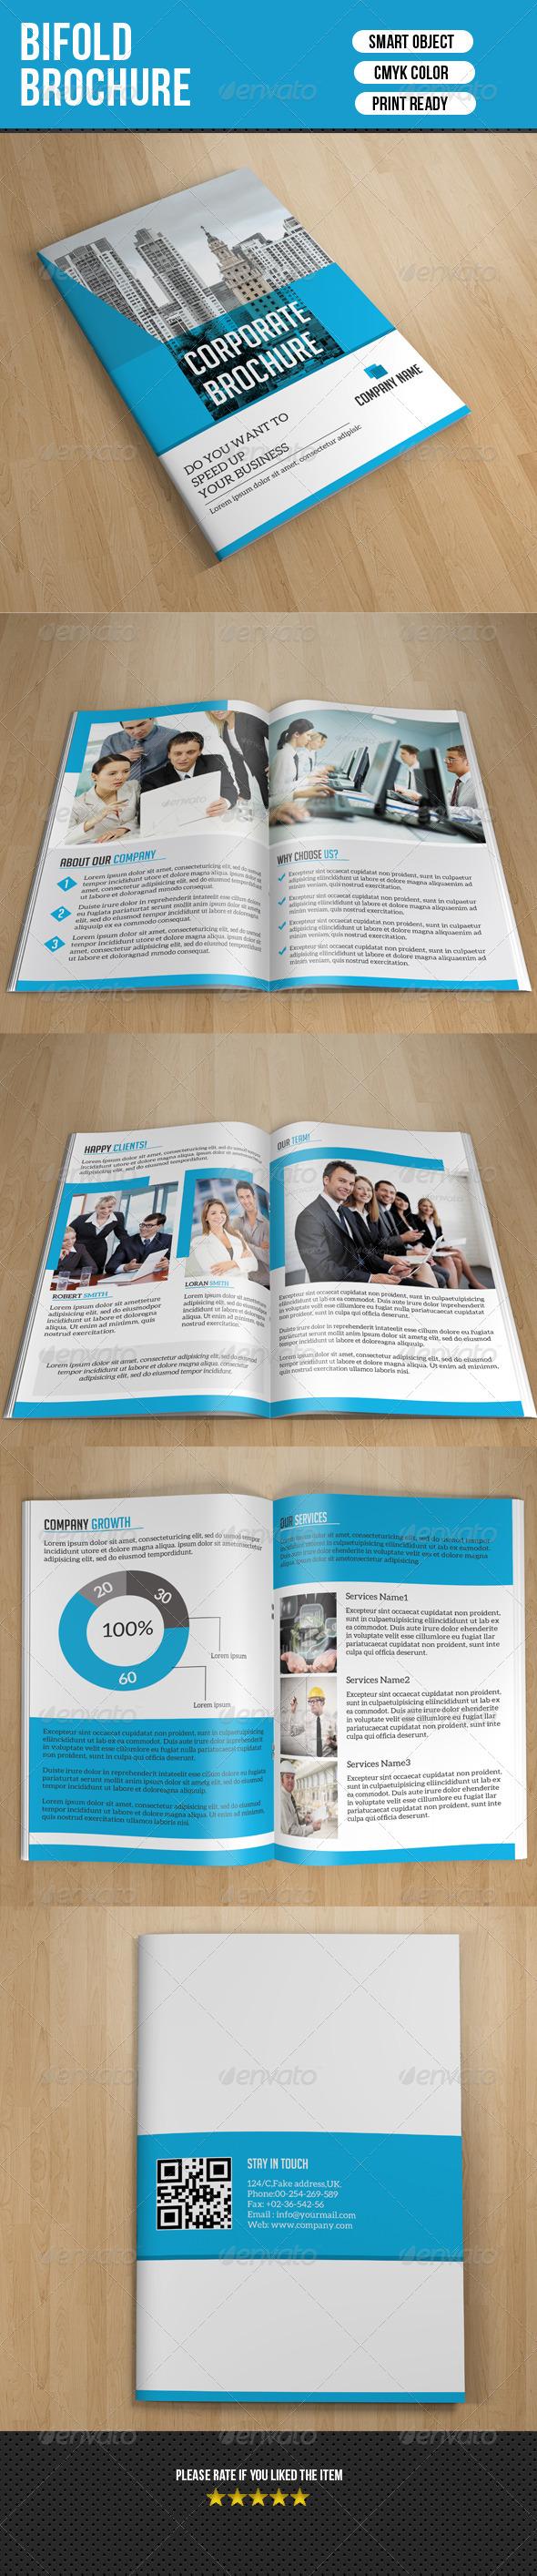 GraphicRiver Business Brochure-V32 7903842